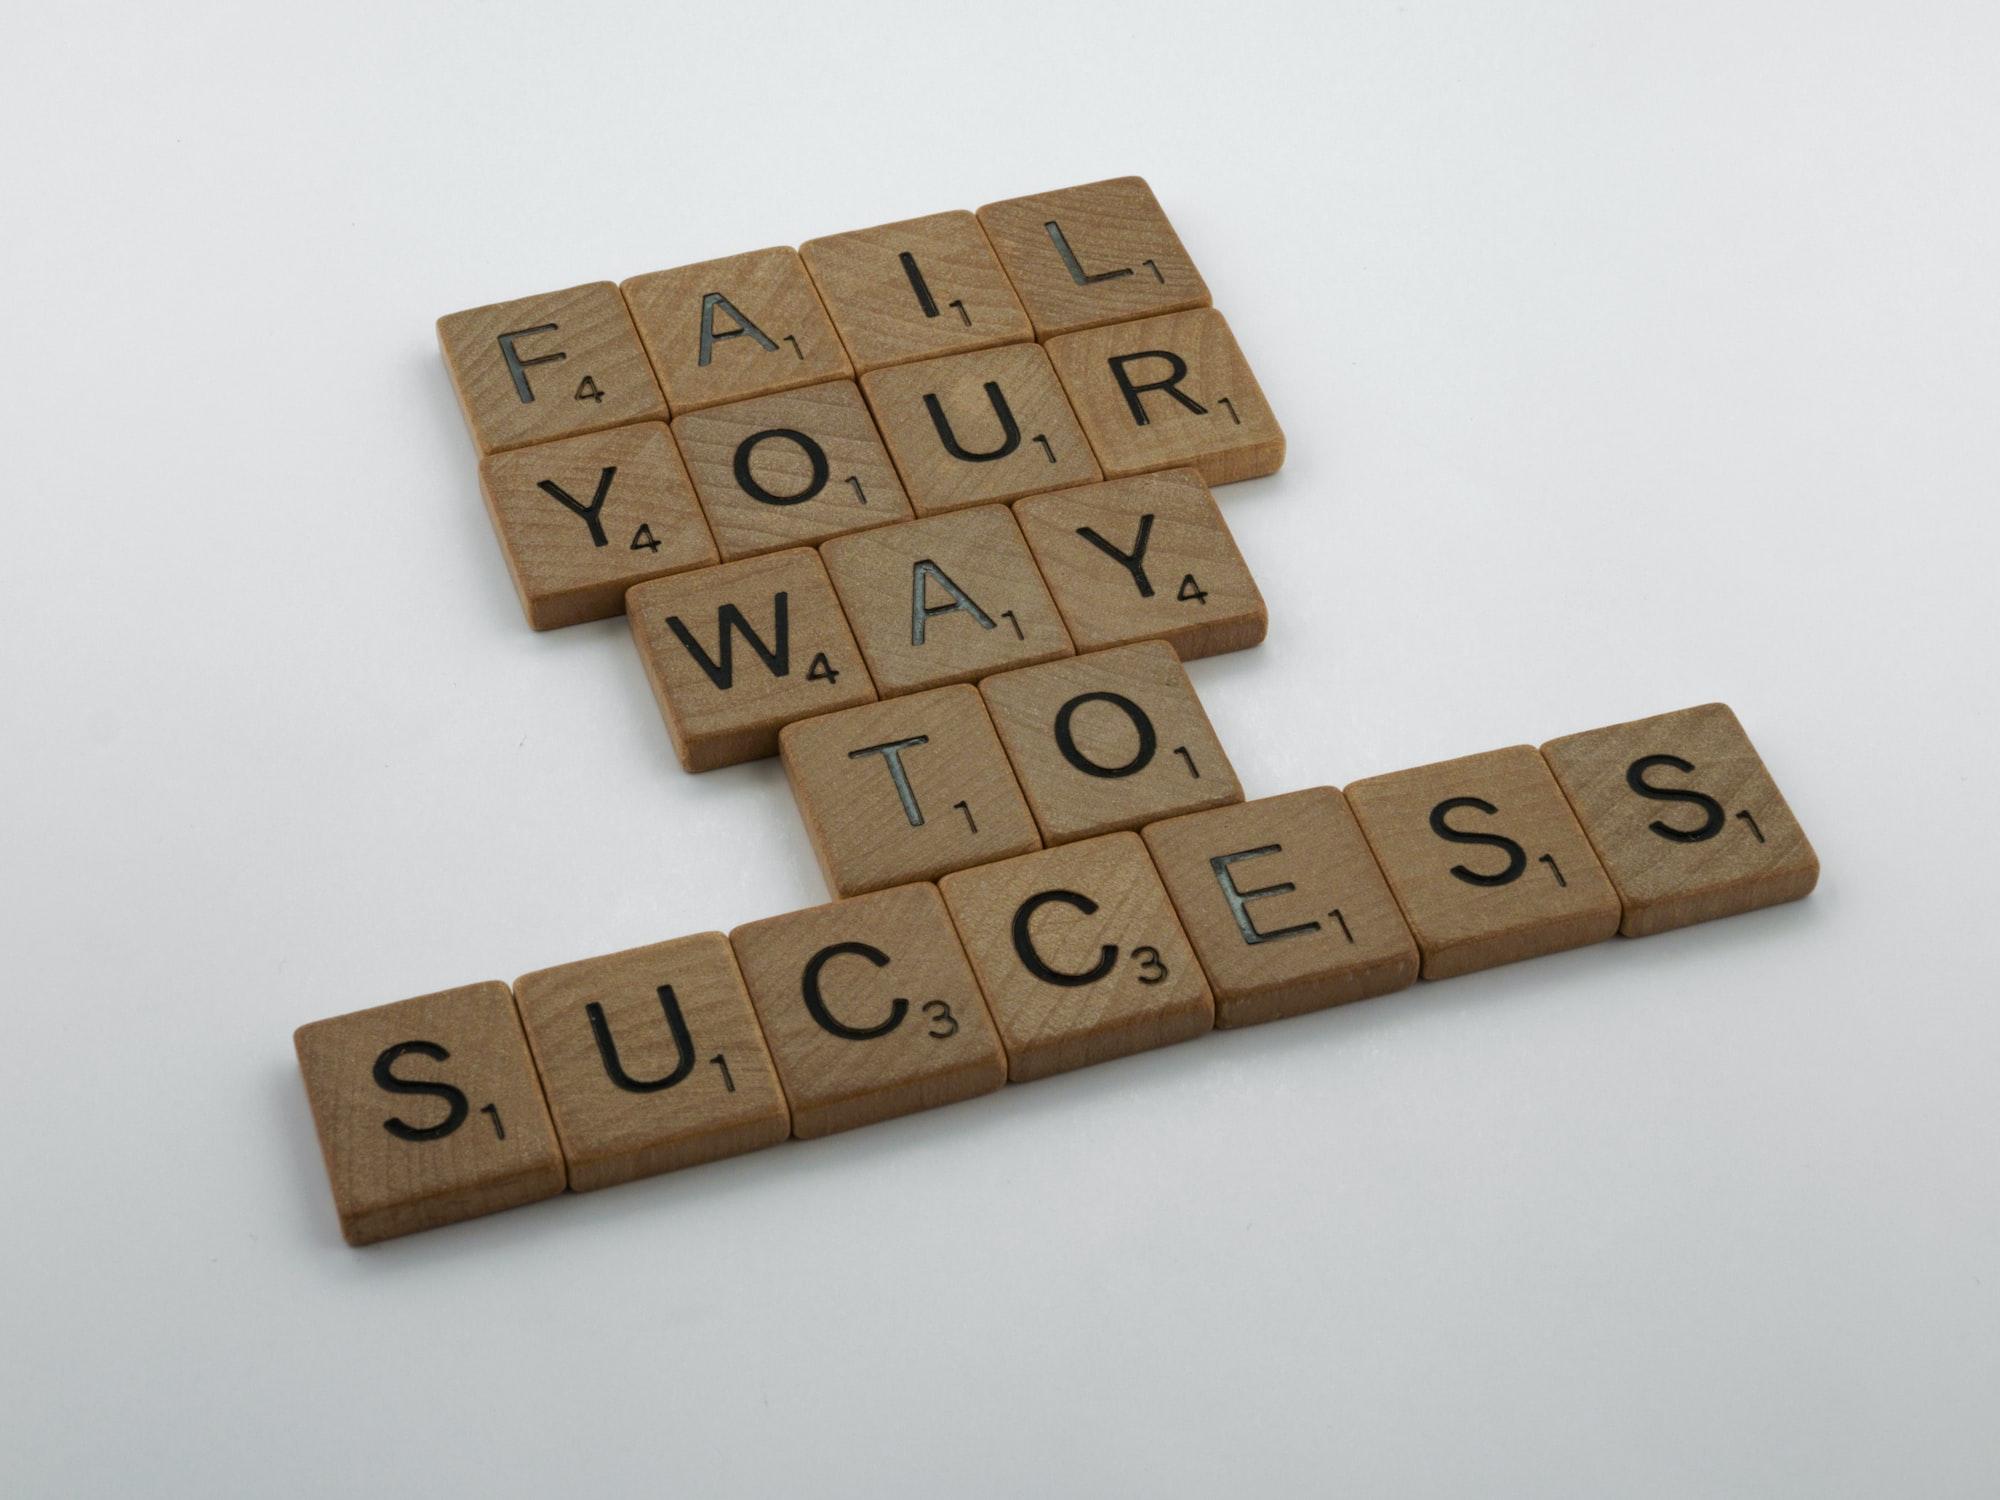 7 Reasons Why Most Entrepreneurs Fail